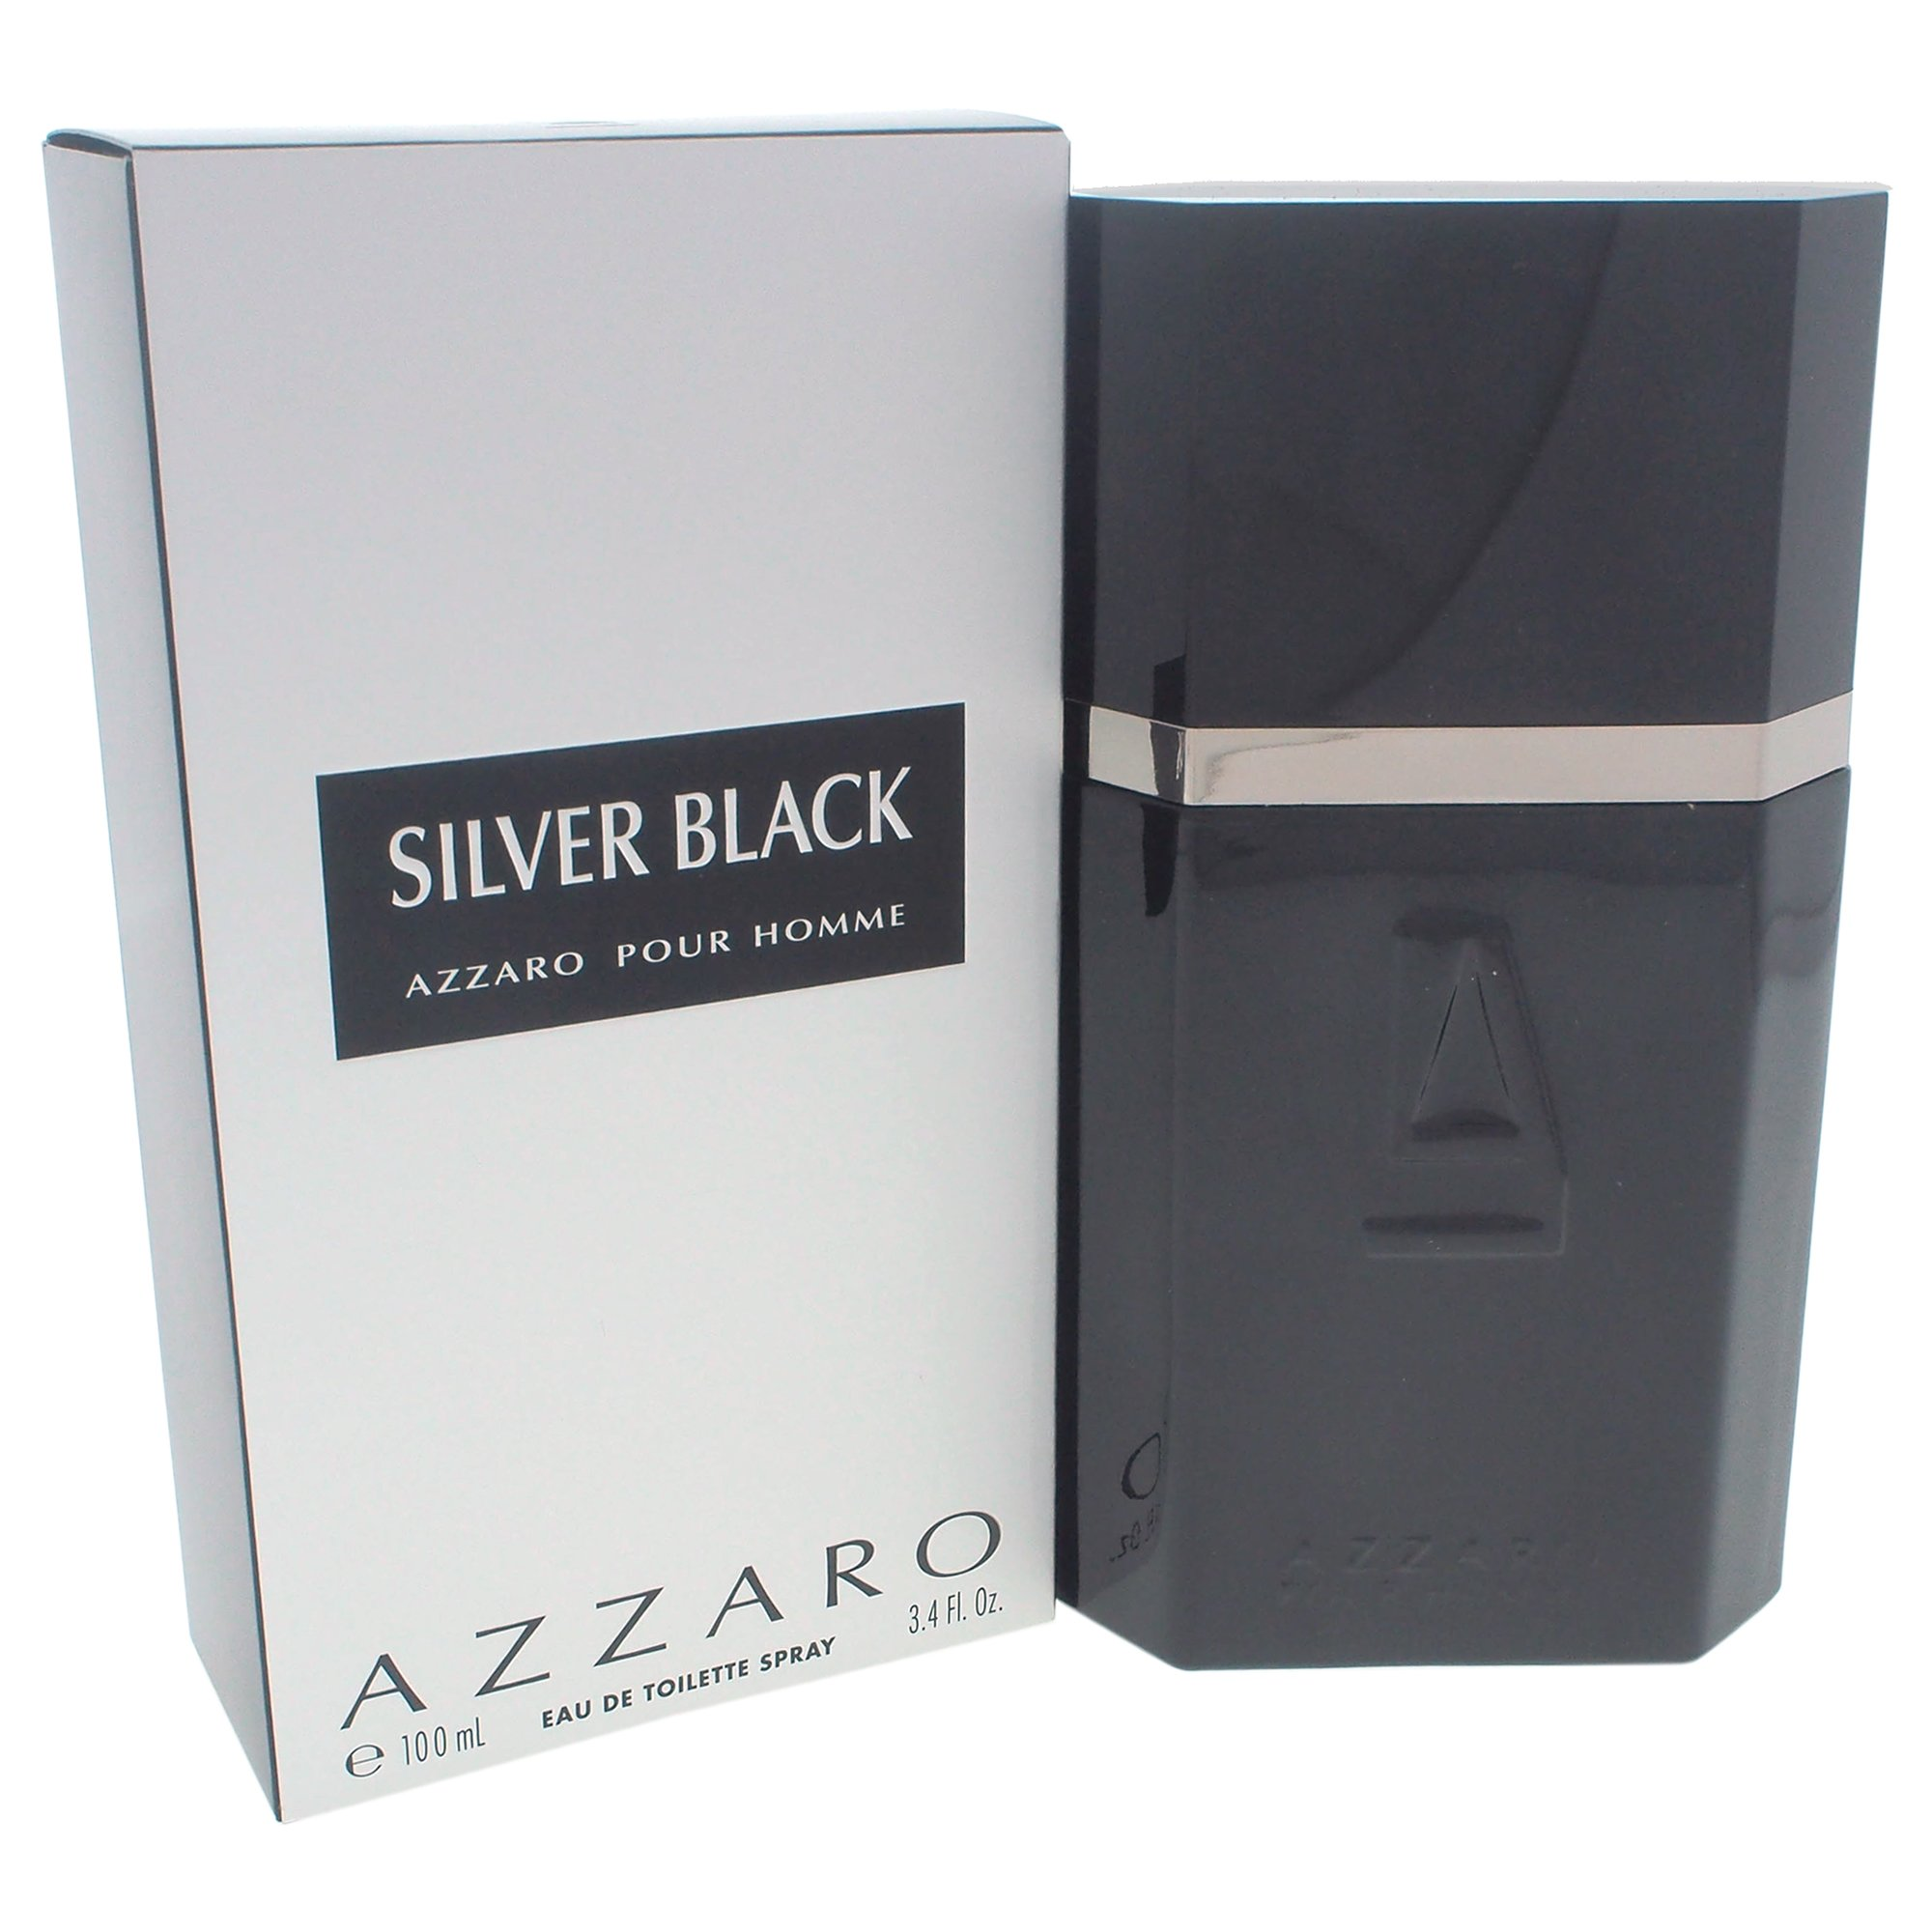 Azzaro Silver Black De Loris Azzaro Eau De Toilette Masculino 100 ml